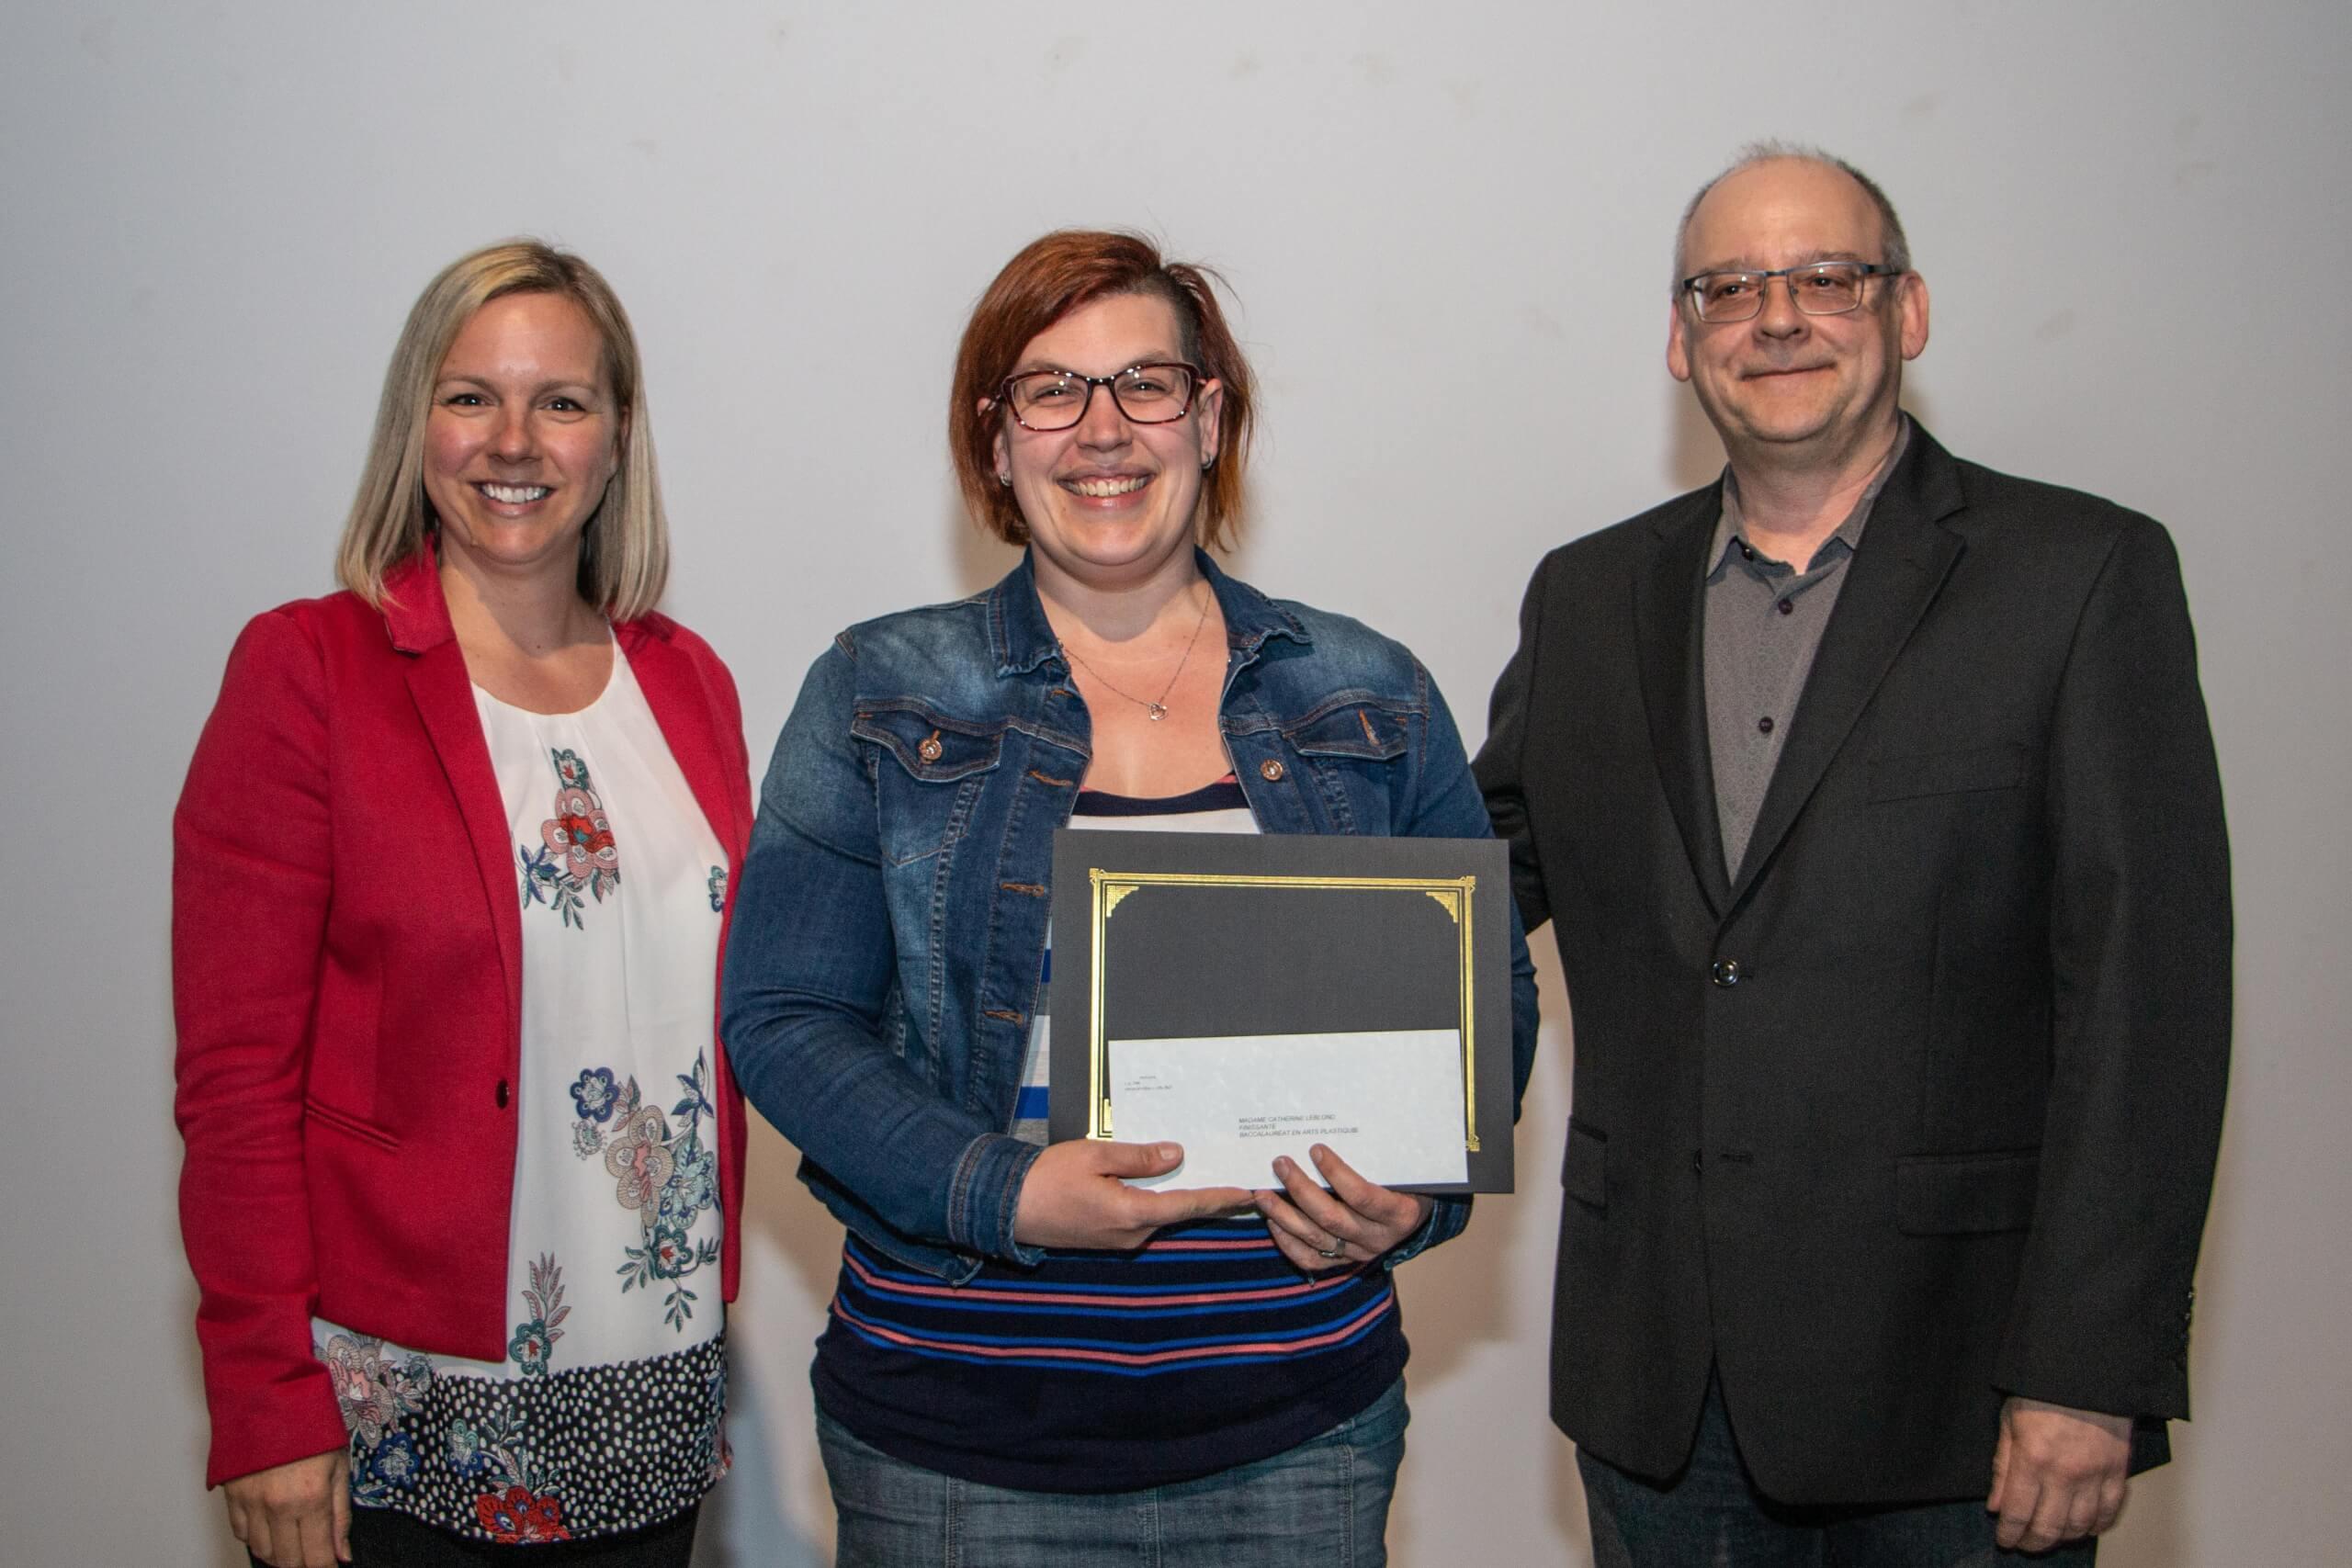 L'artiste Catherine Leblond remporte la Bourse Gilles-Verville 2019